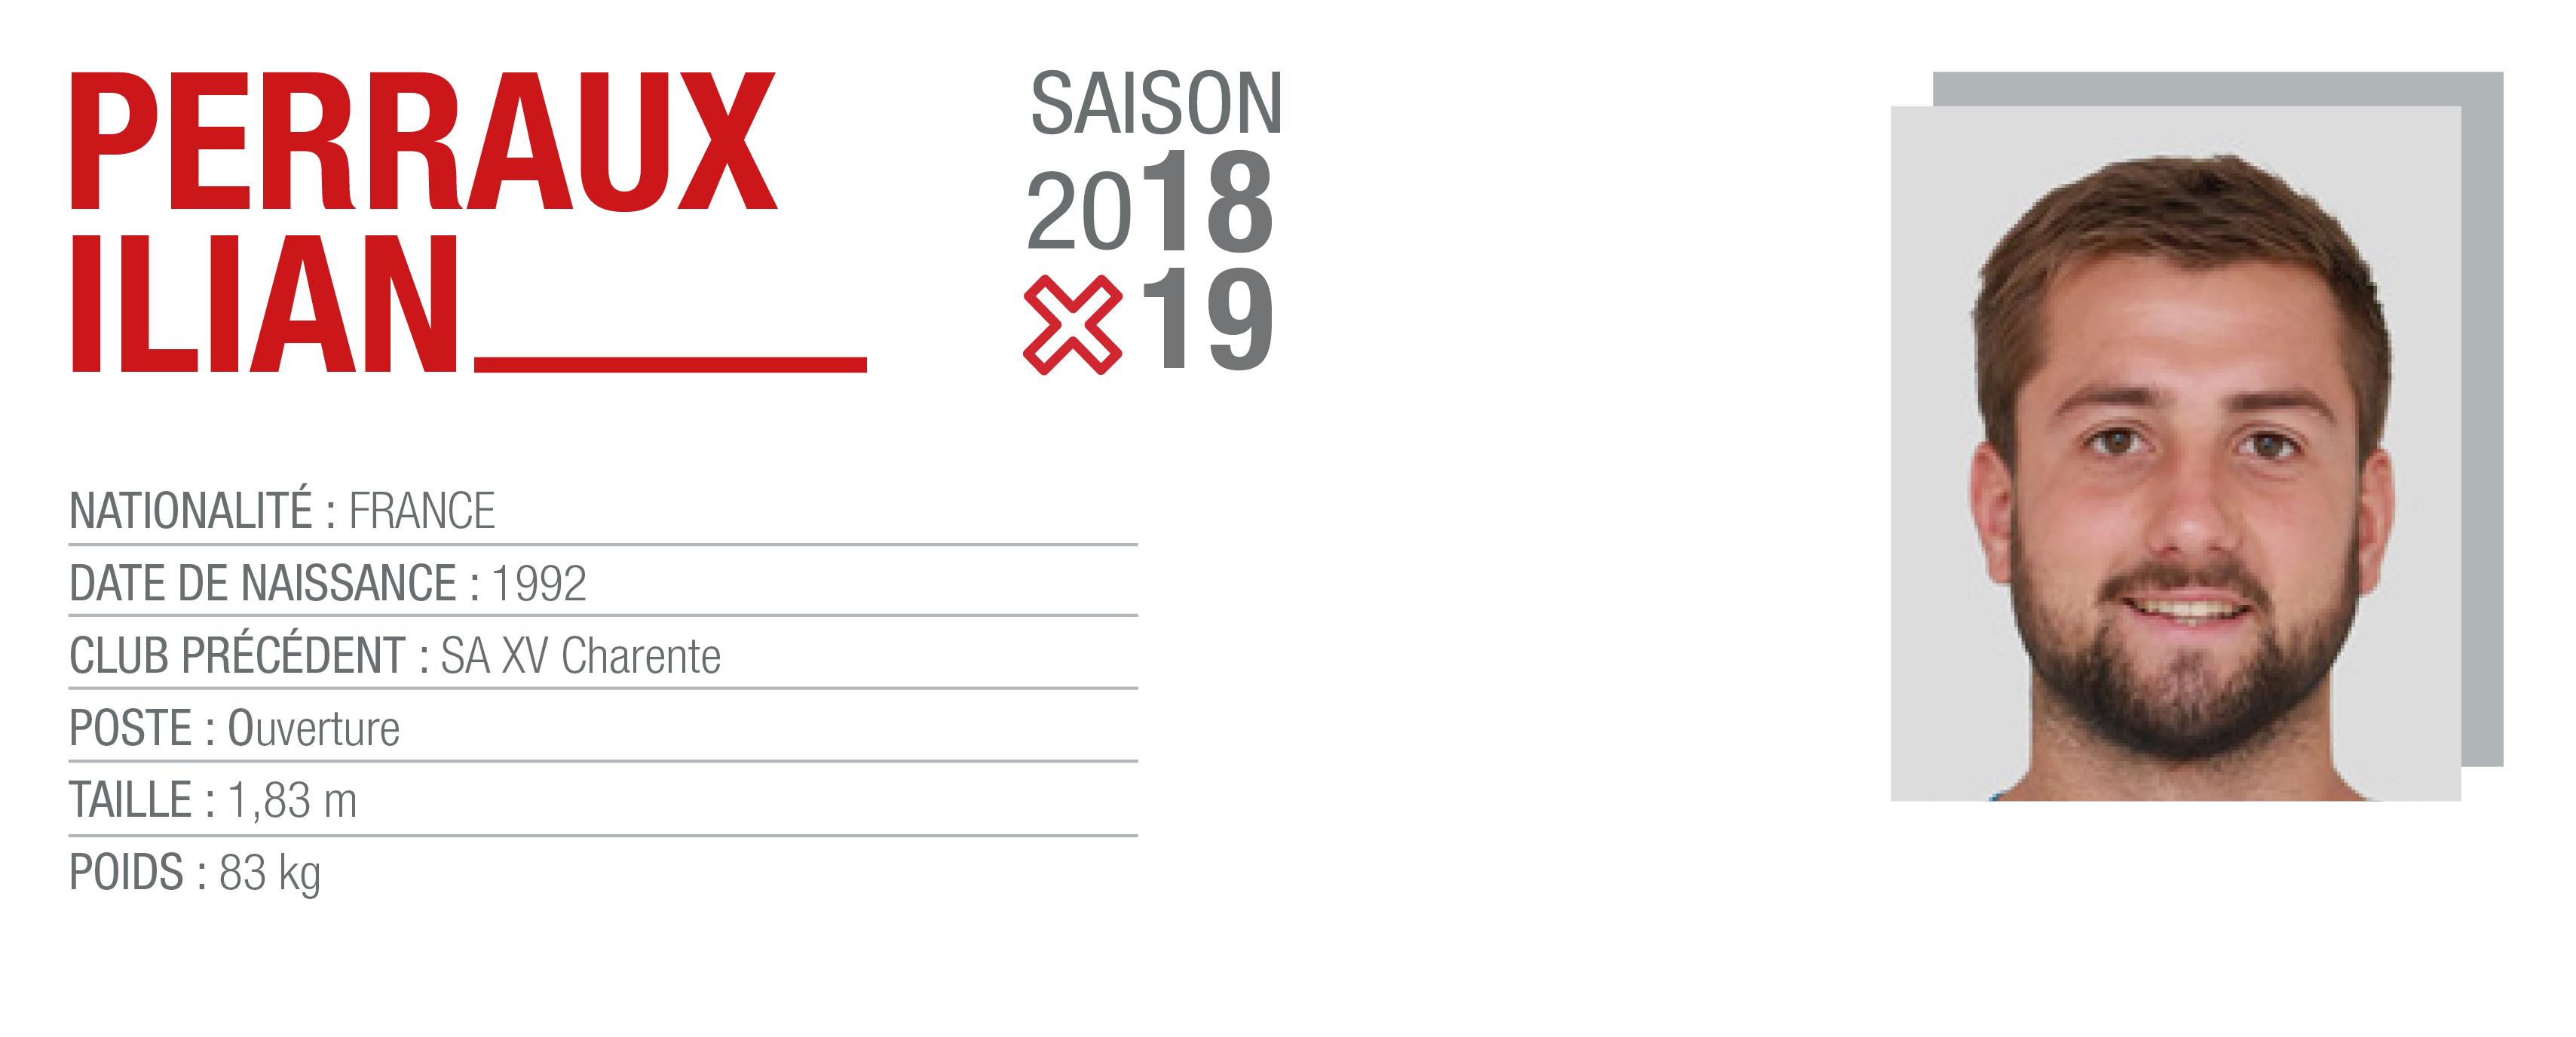 SAISON 2018 - 2019 - Page 2 5b239421c8879b42b13c4816